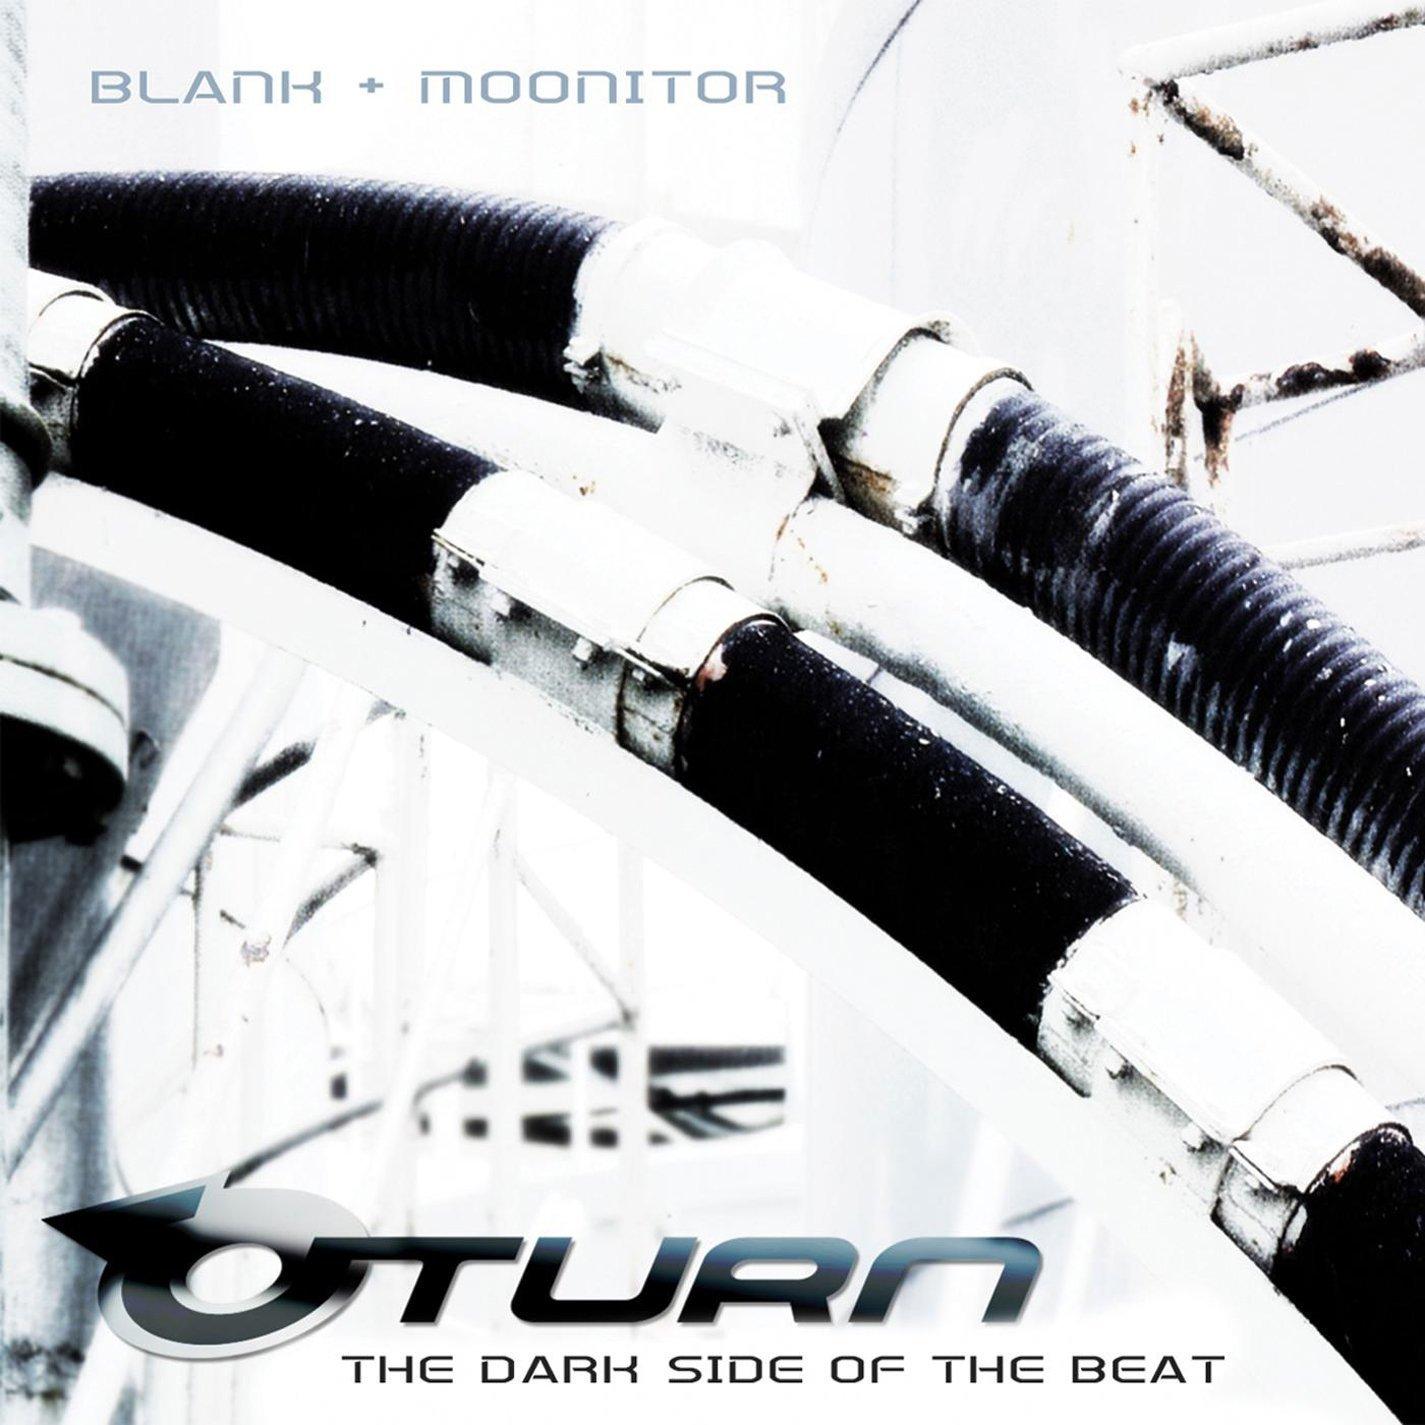 CD : Moonitor - Uturn 3: The Dark Side Of The Beat (CD)